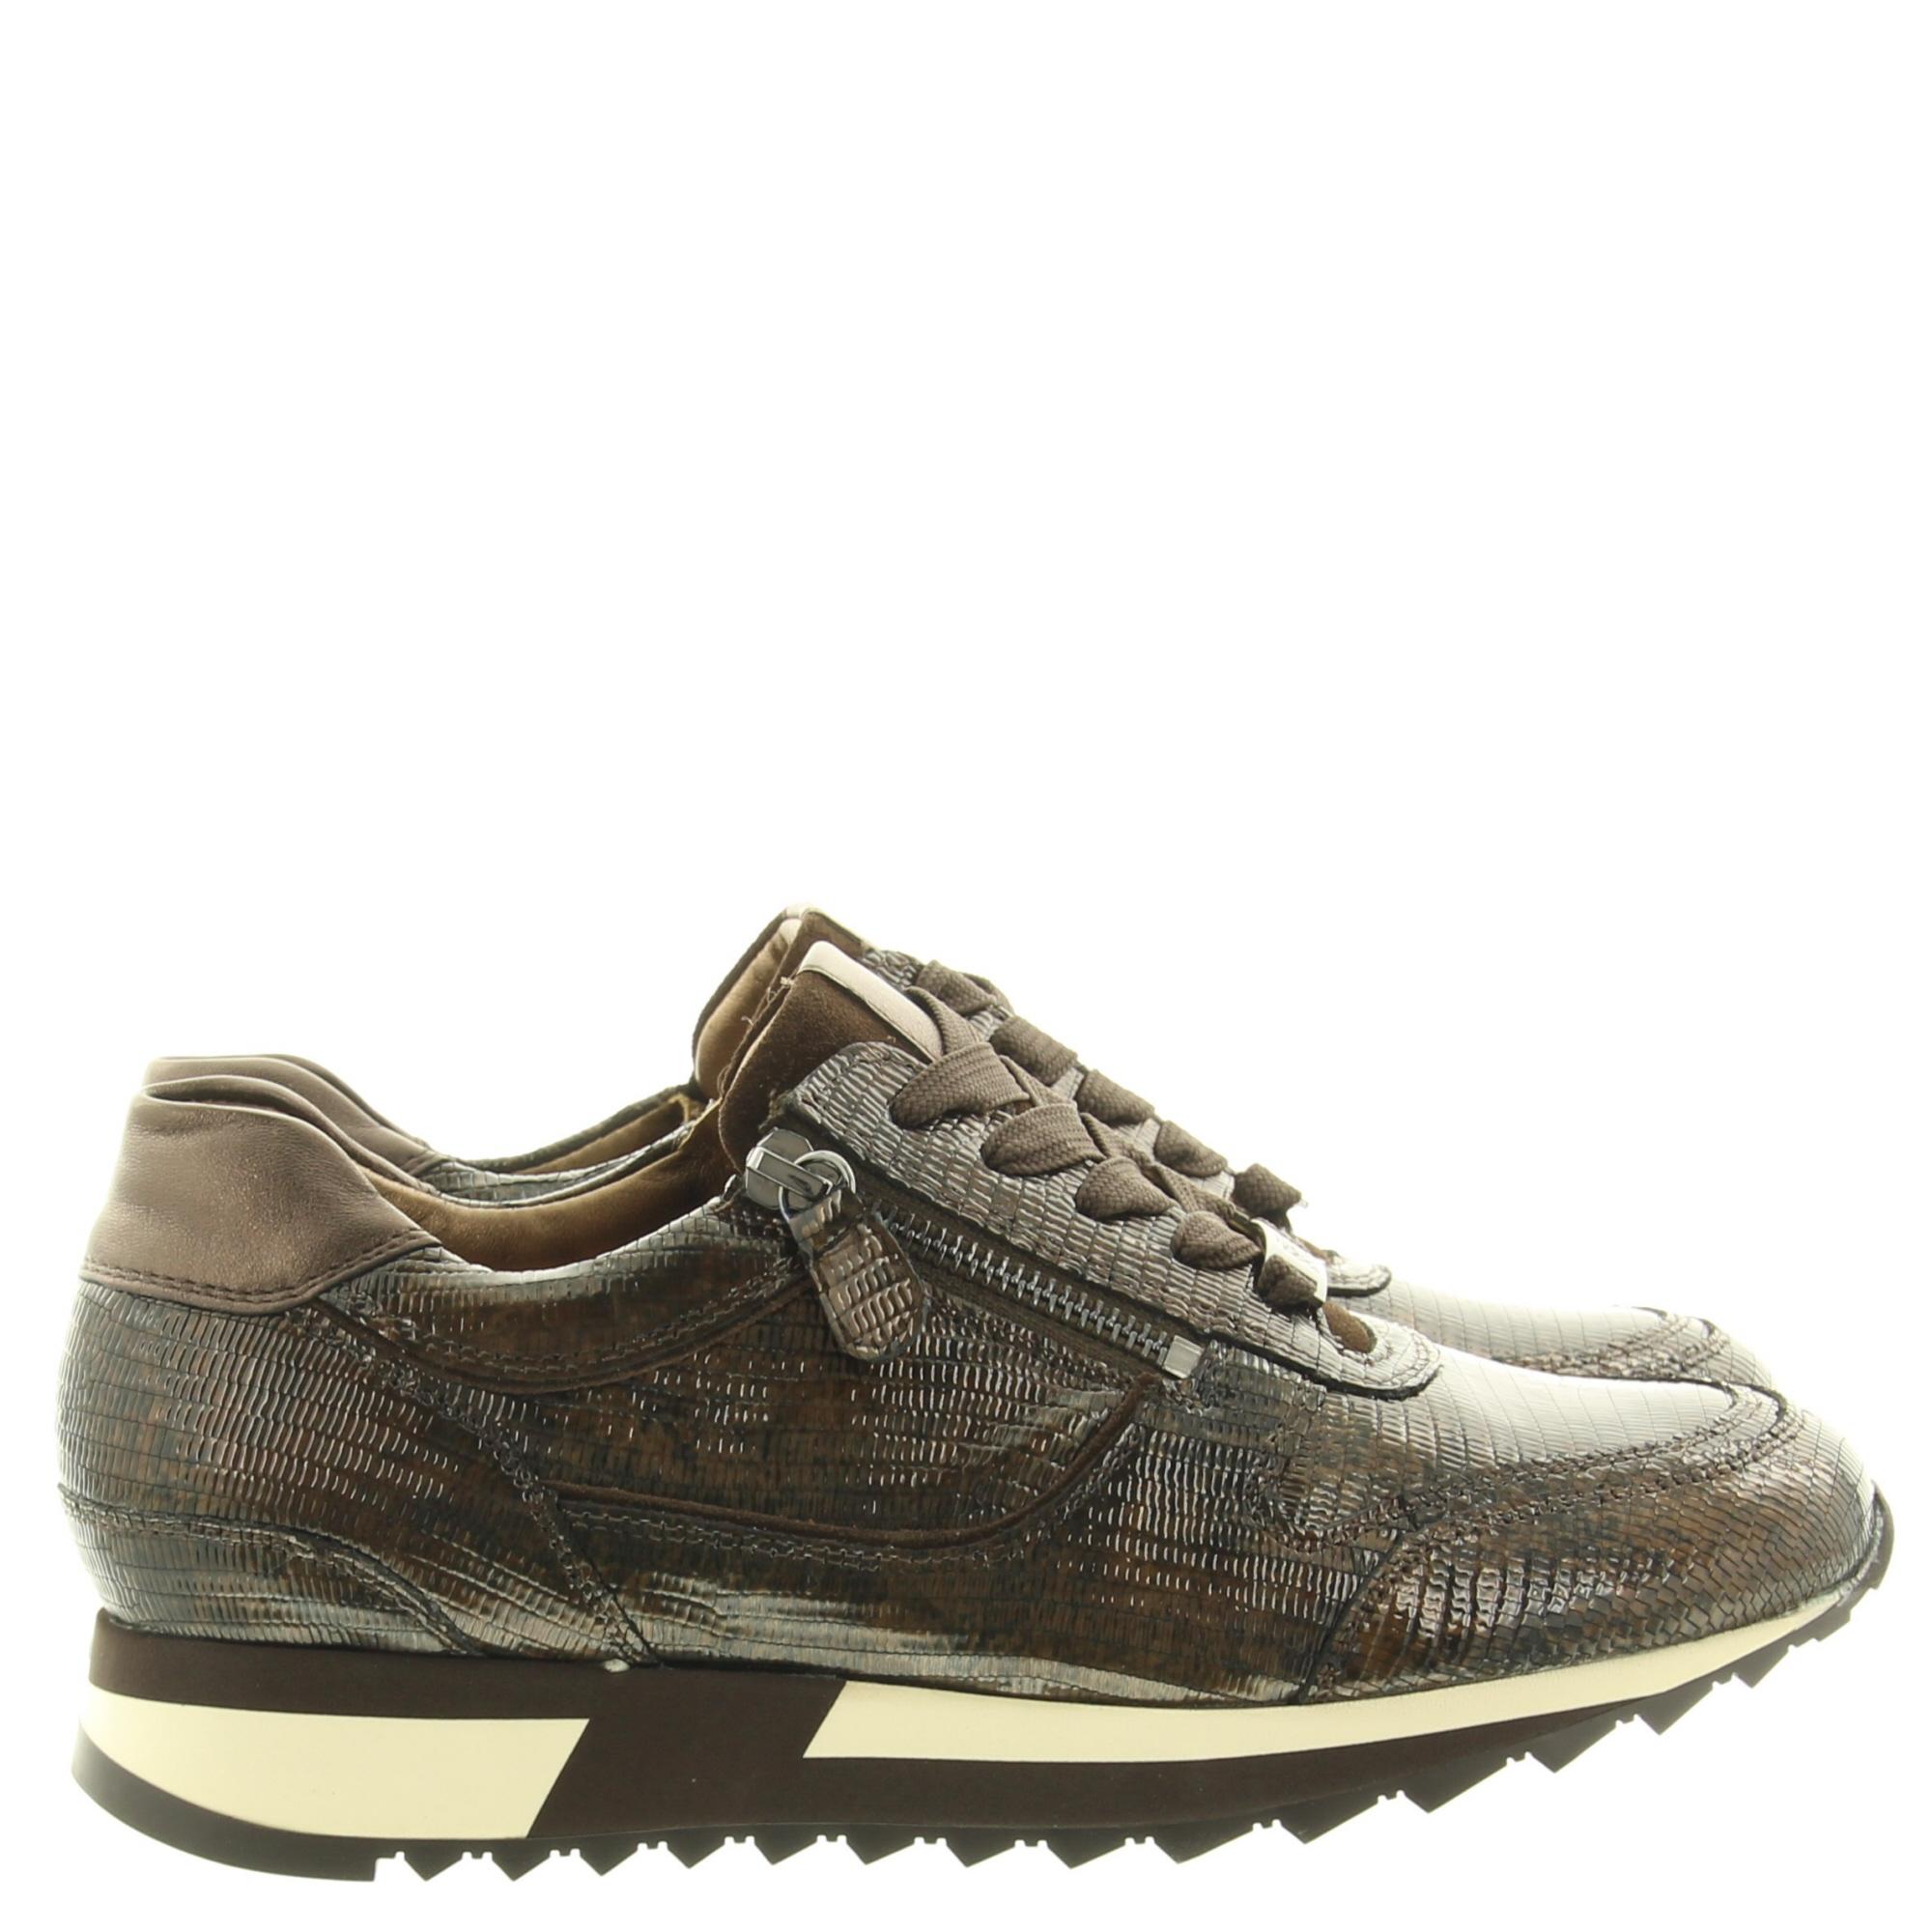 Hassia Shoes 302027 Barcelona 1986  Dark Brown Crocolack